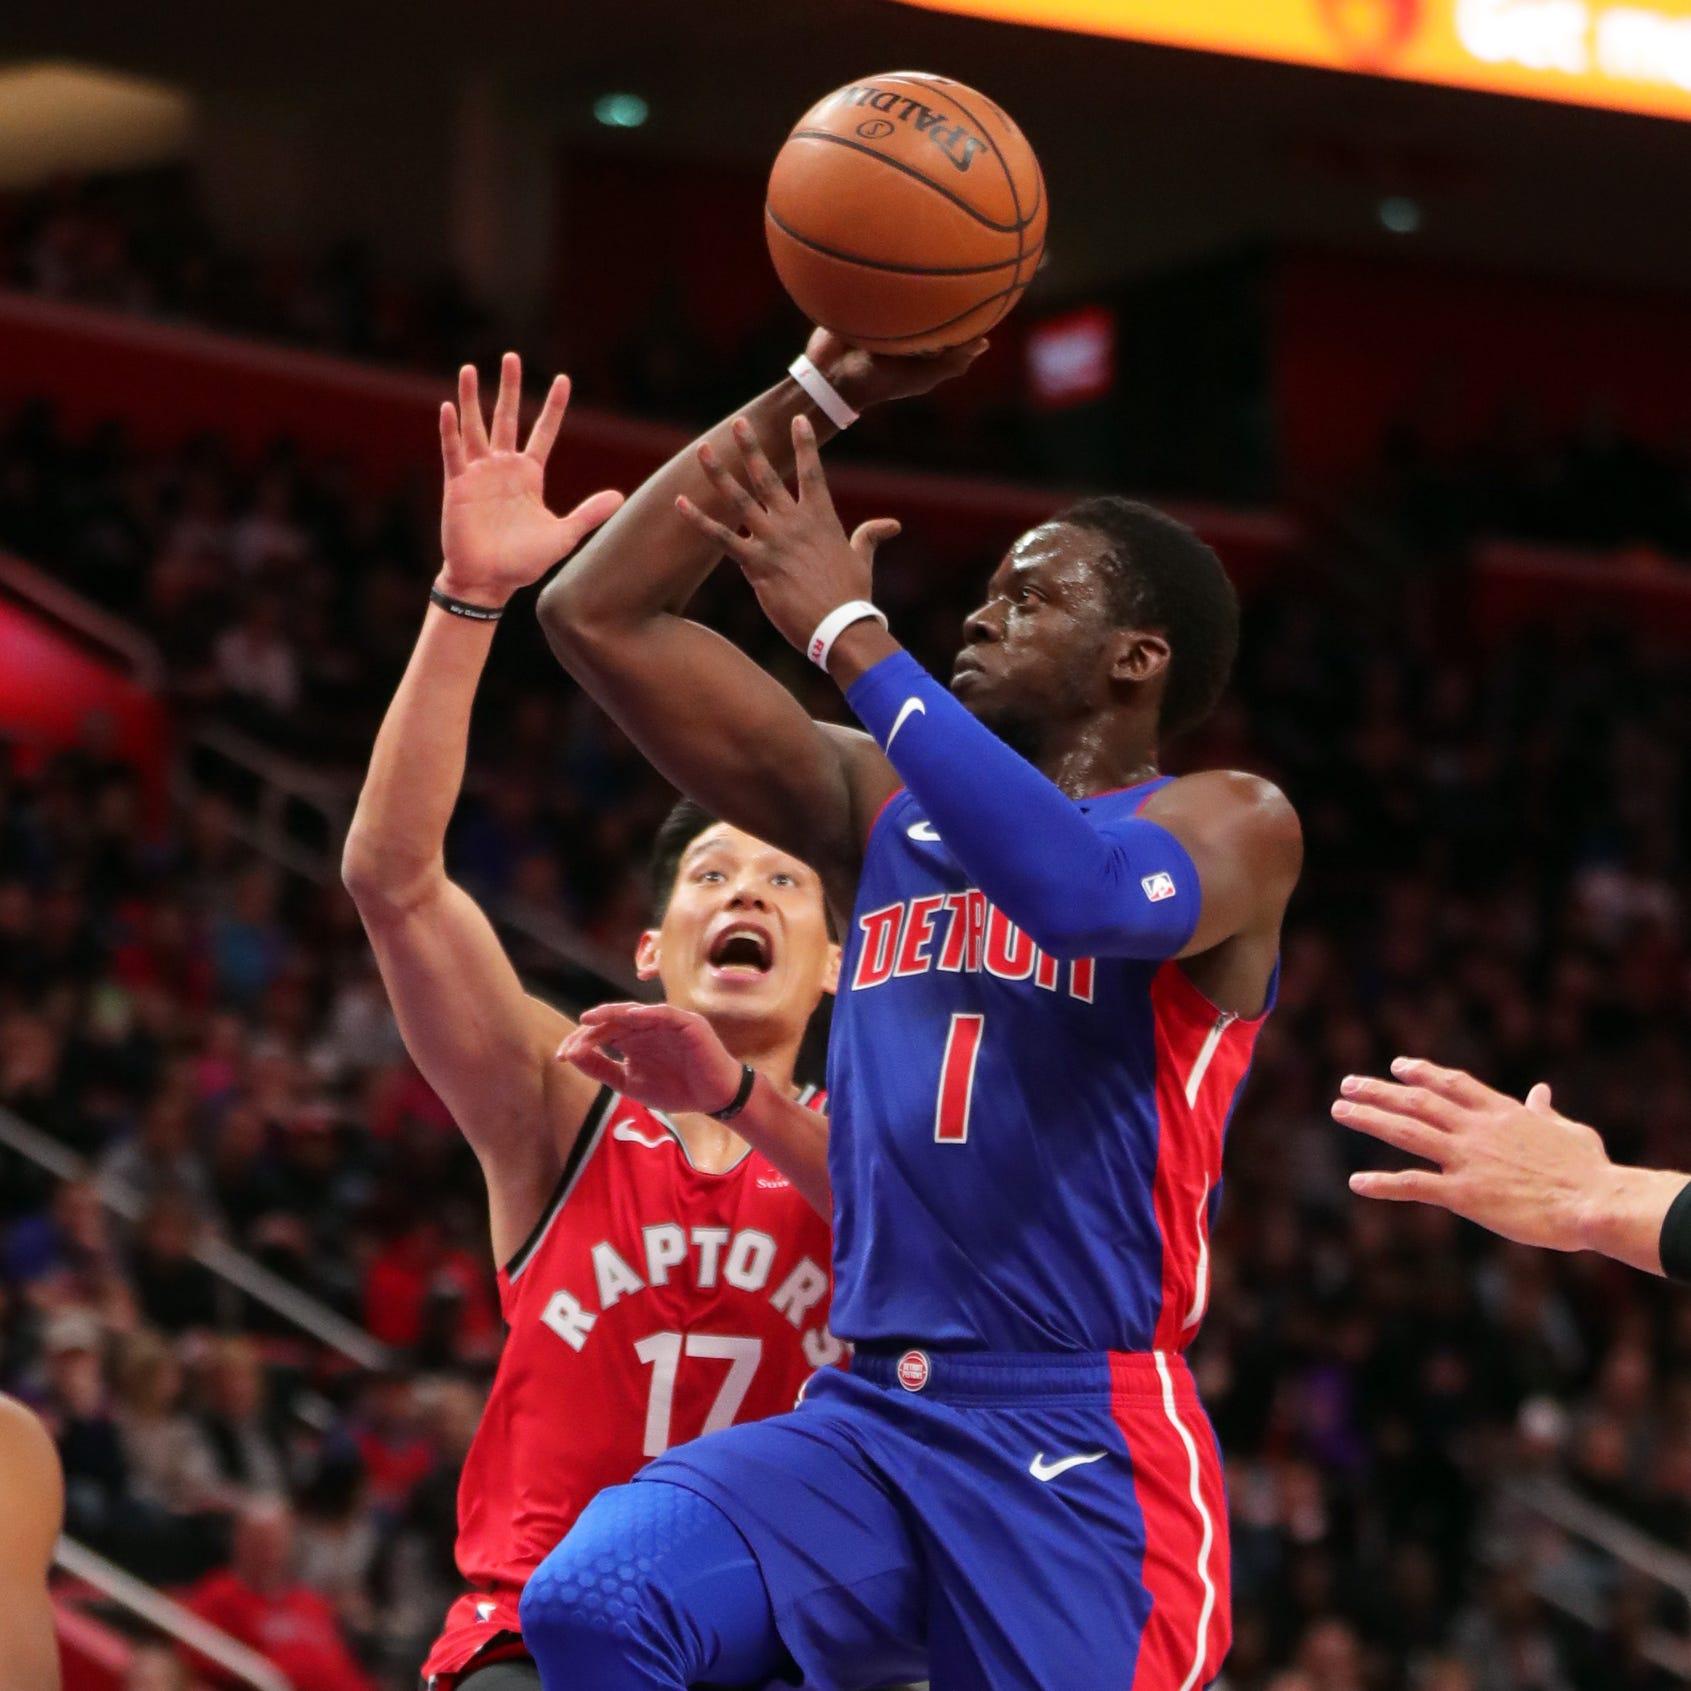 Detroit Pistons rally past Toronto Raptors in OT, grab 6th seed in East